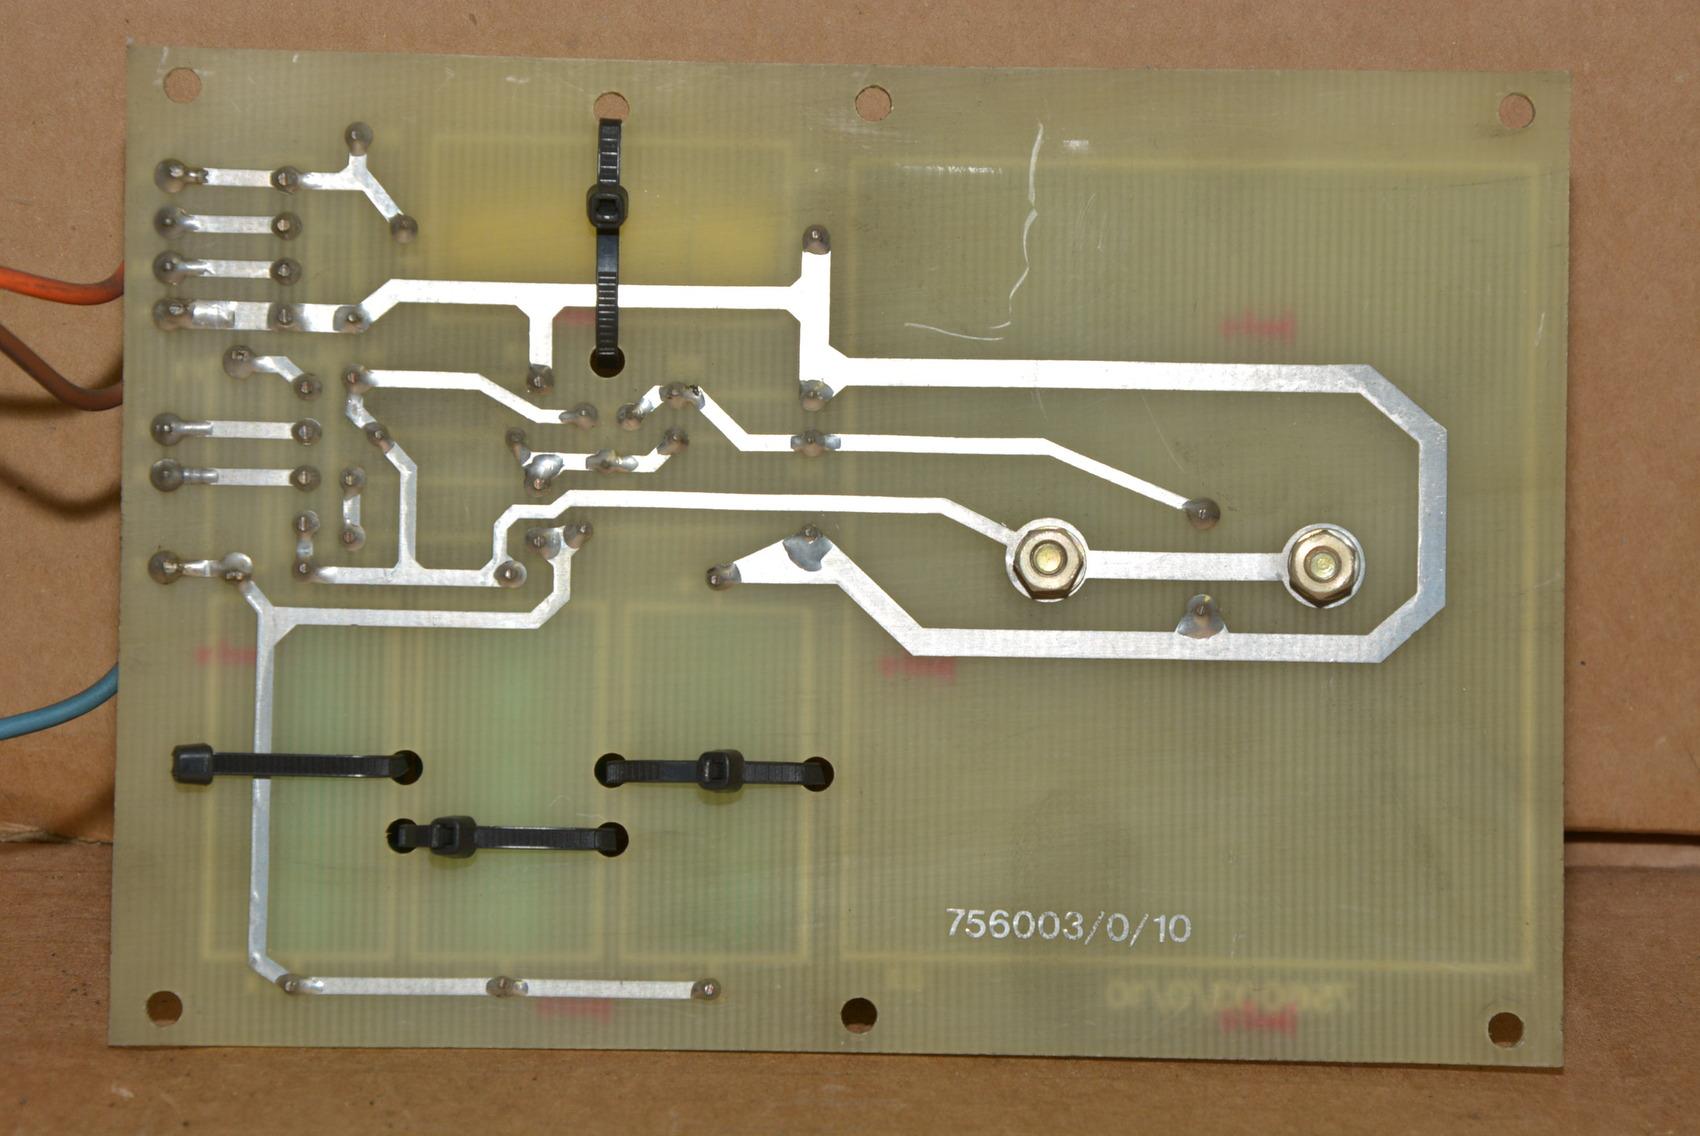 Printed Wiring Assembly : Elox fanuc tape cut printed circuit board